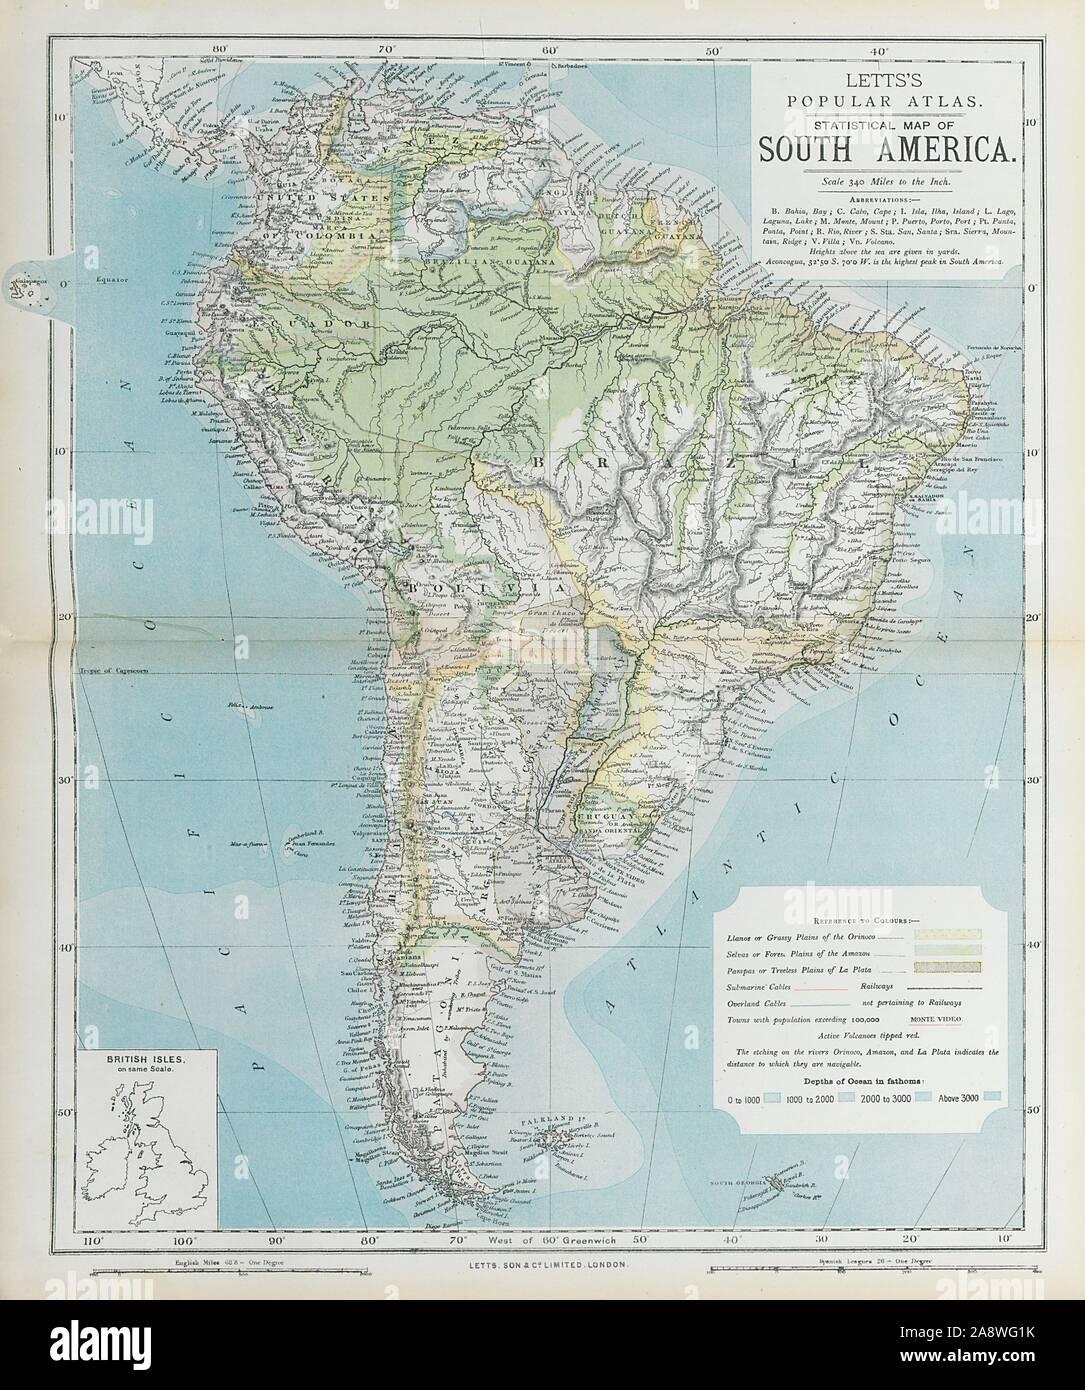 SOUTH AMERICA. Amazon rainforest. Pampas Selvas Llanos ... on